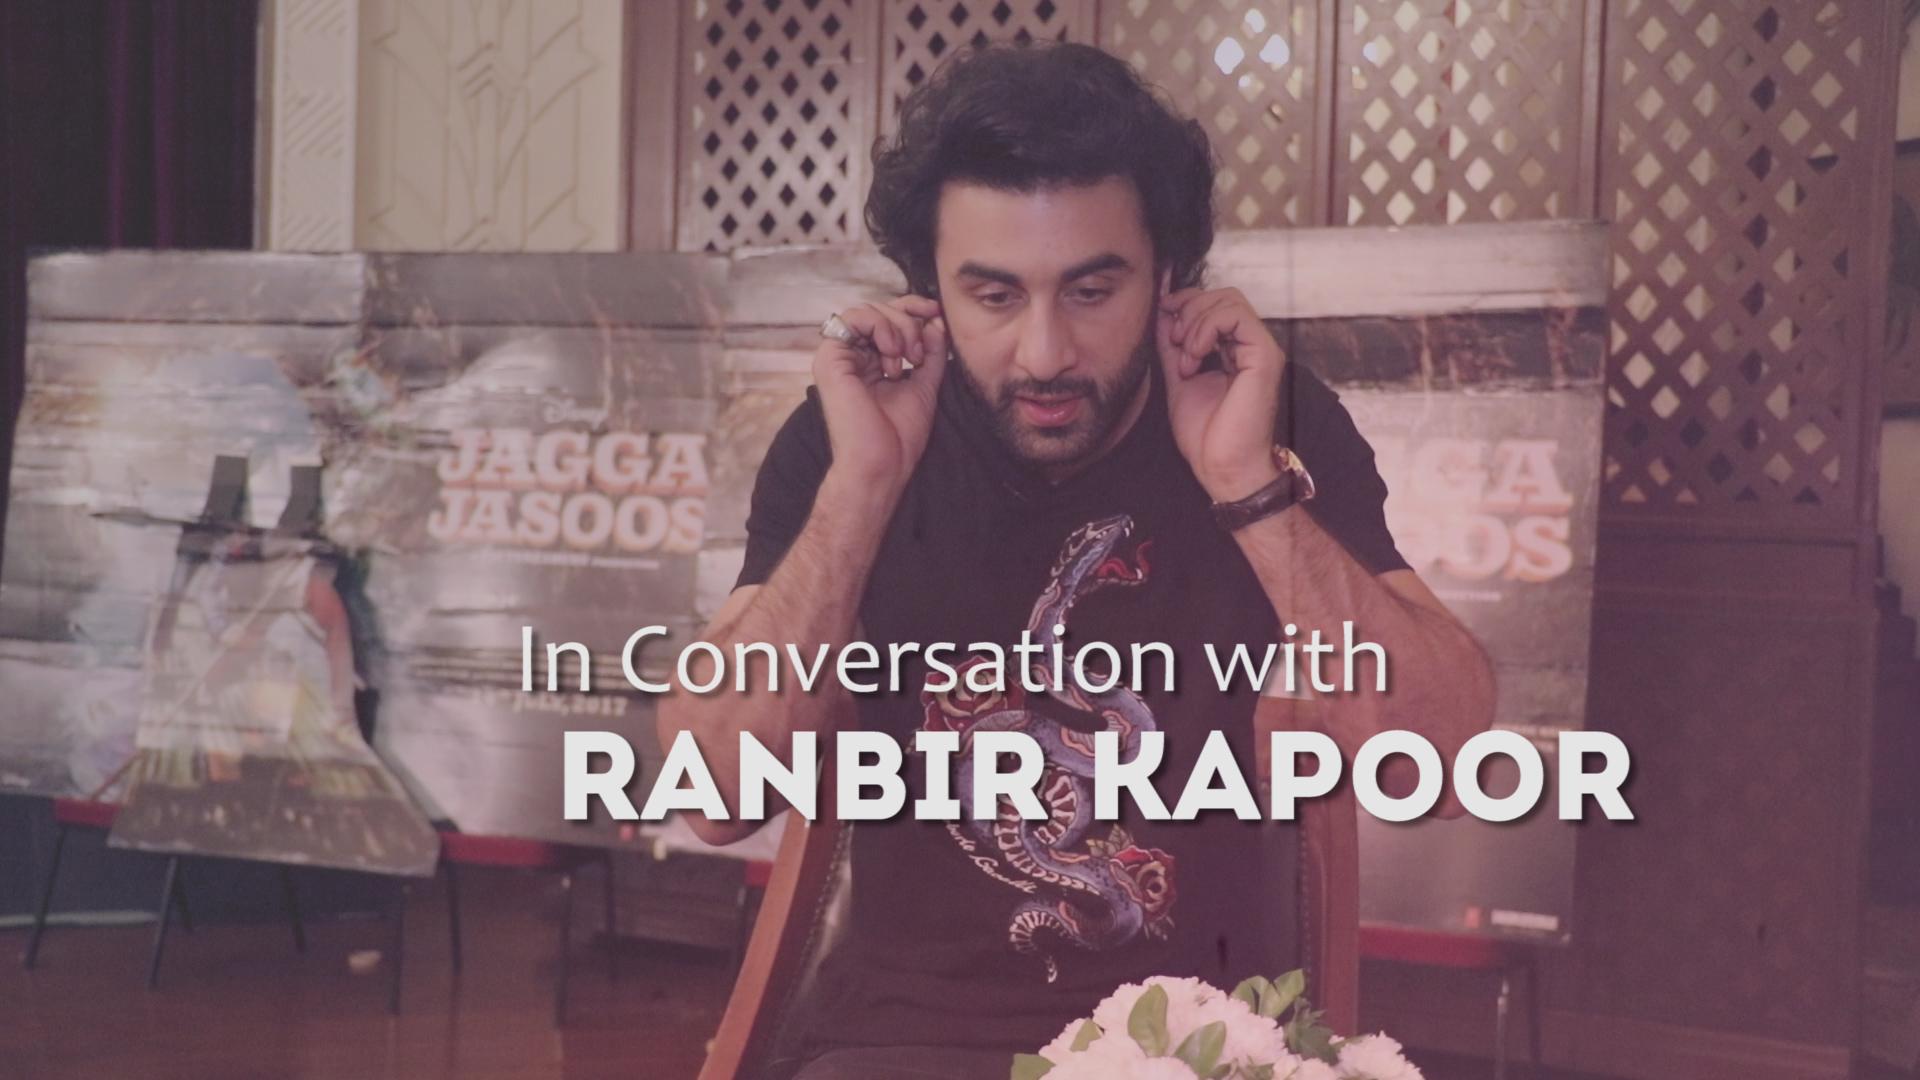 Ranbir kapoor on jagga jasoos i katrina kaif anurag basu have worked very hard on it the indian express - Interview Ranbir Kapoor Opens Up On Life Movies And Katrina Kaif Like Never Before